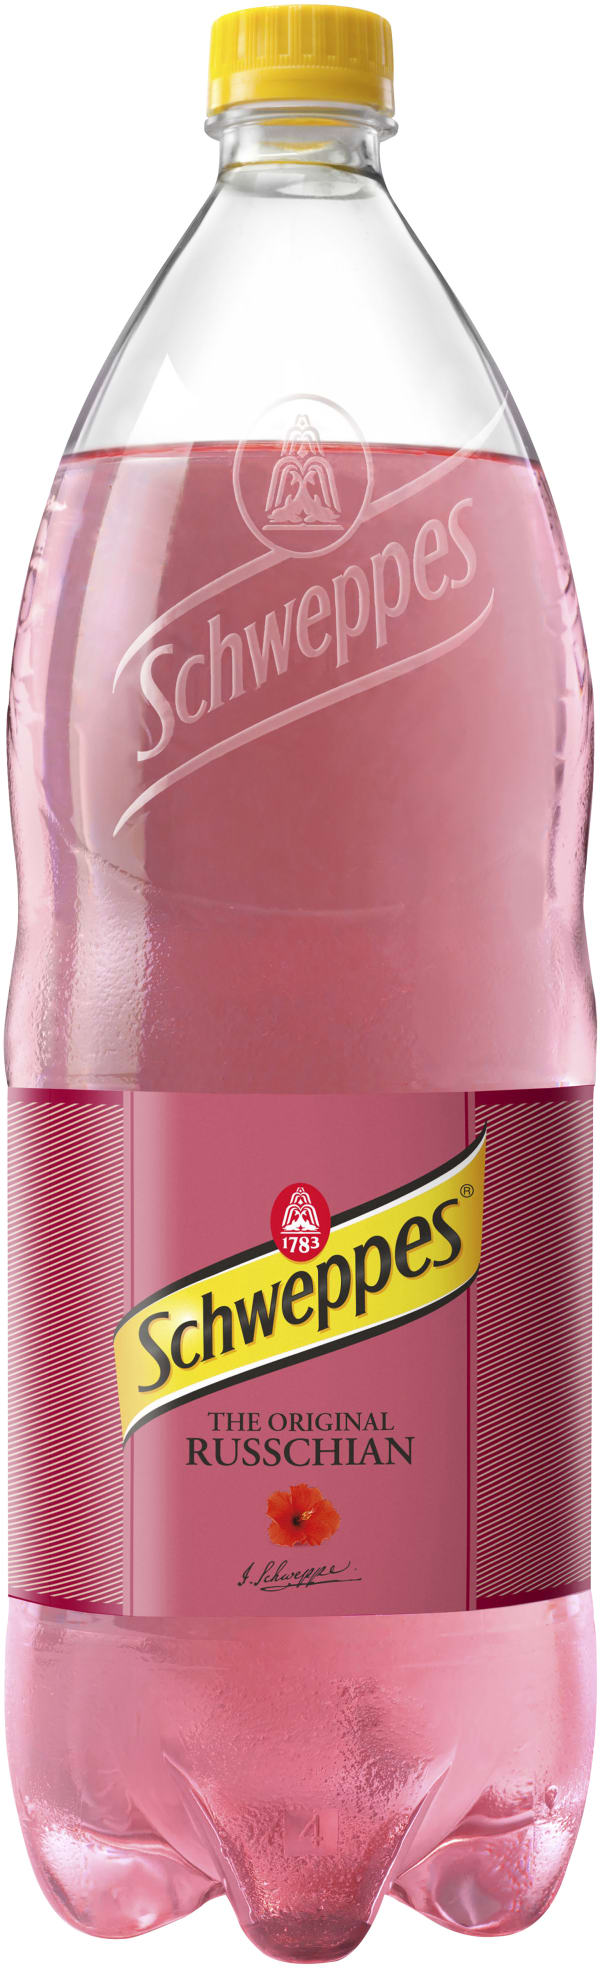 Schweppes Russchian plastic bottle